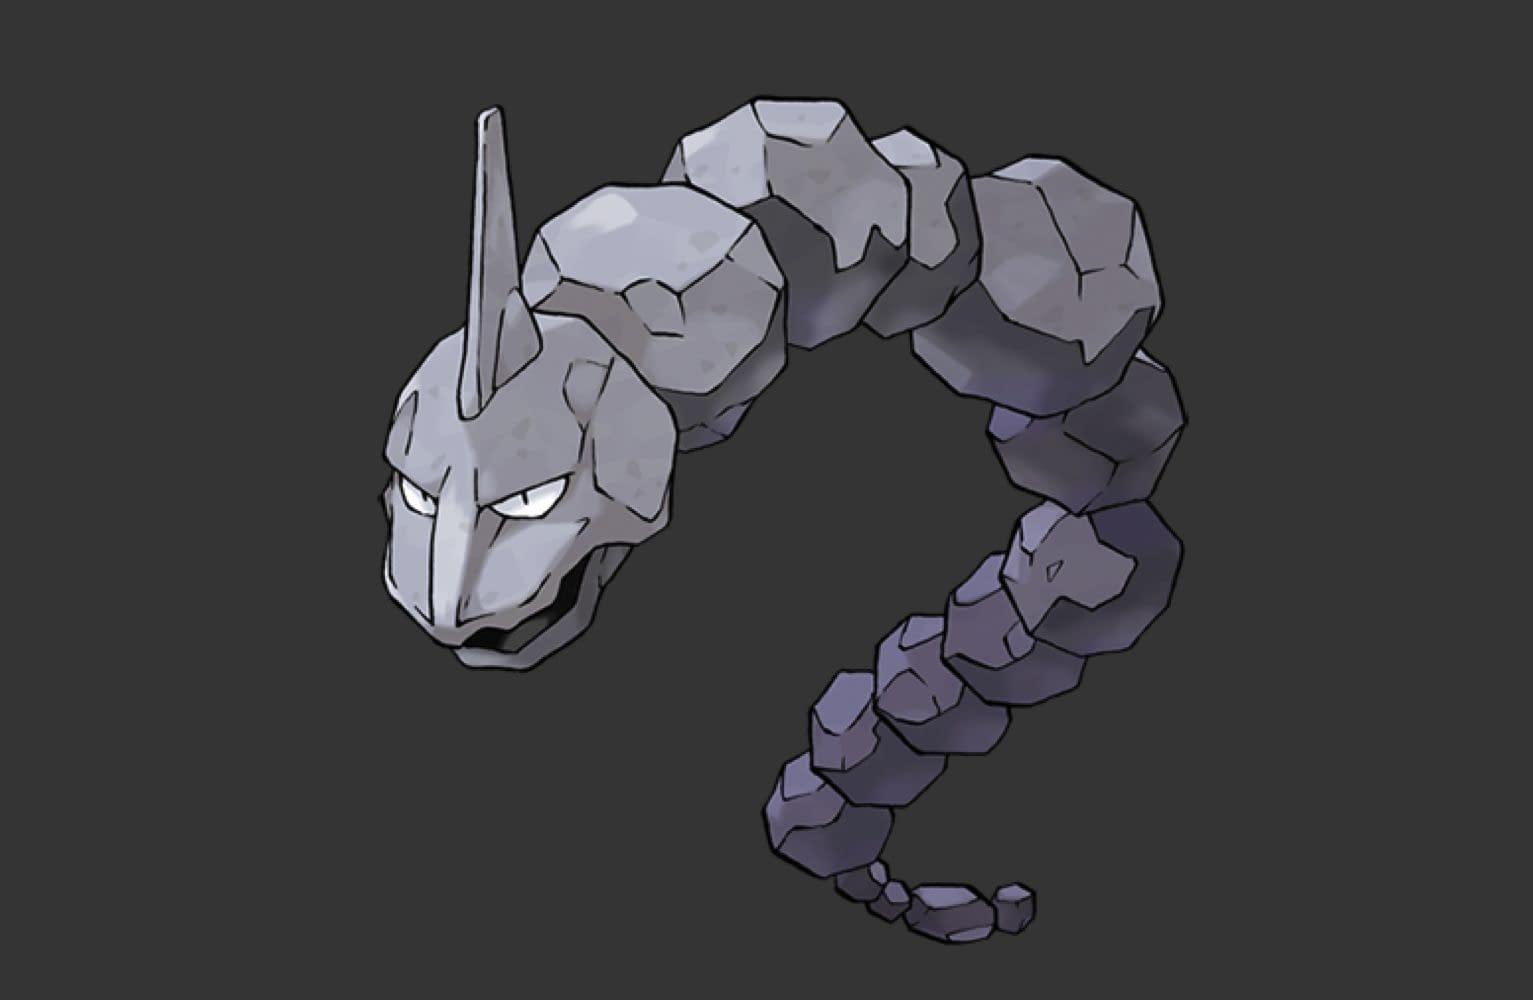 Shadow Exeggutor Onix Raid Guide Catch Brock S Rocky Buddy In Pokemon Go onix raid guide catch brock s rocky